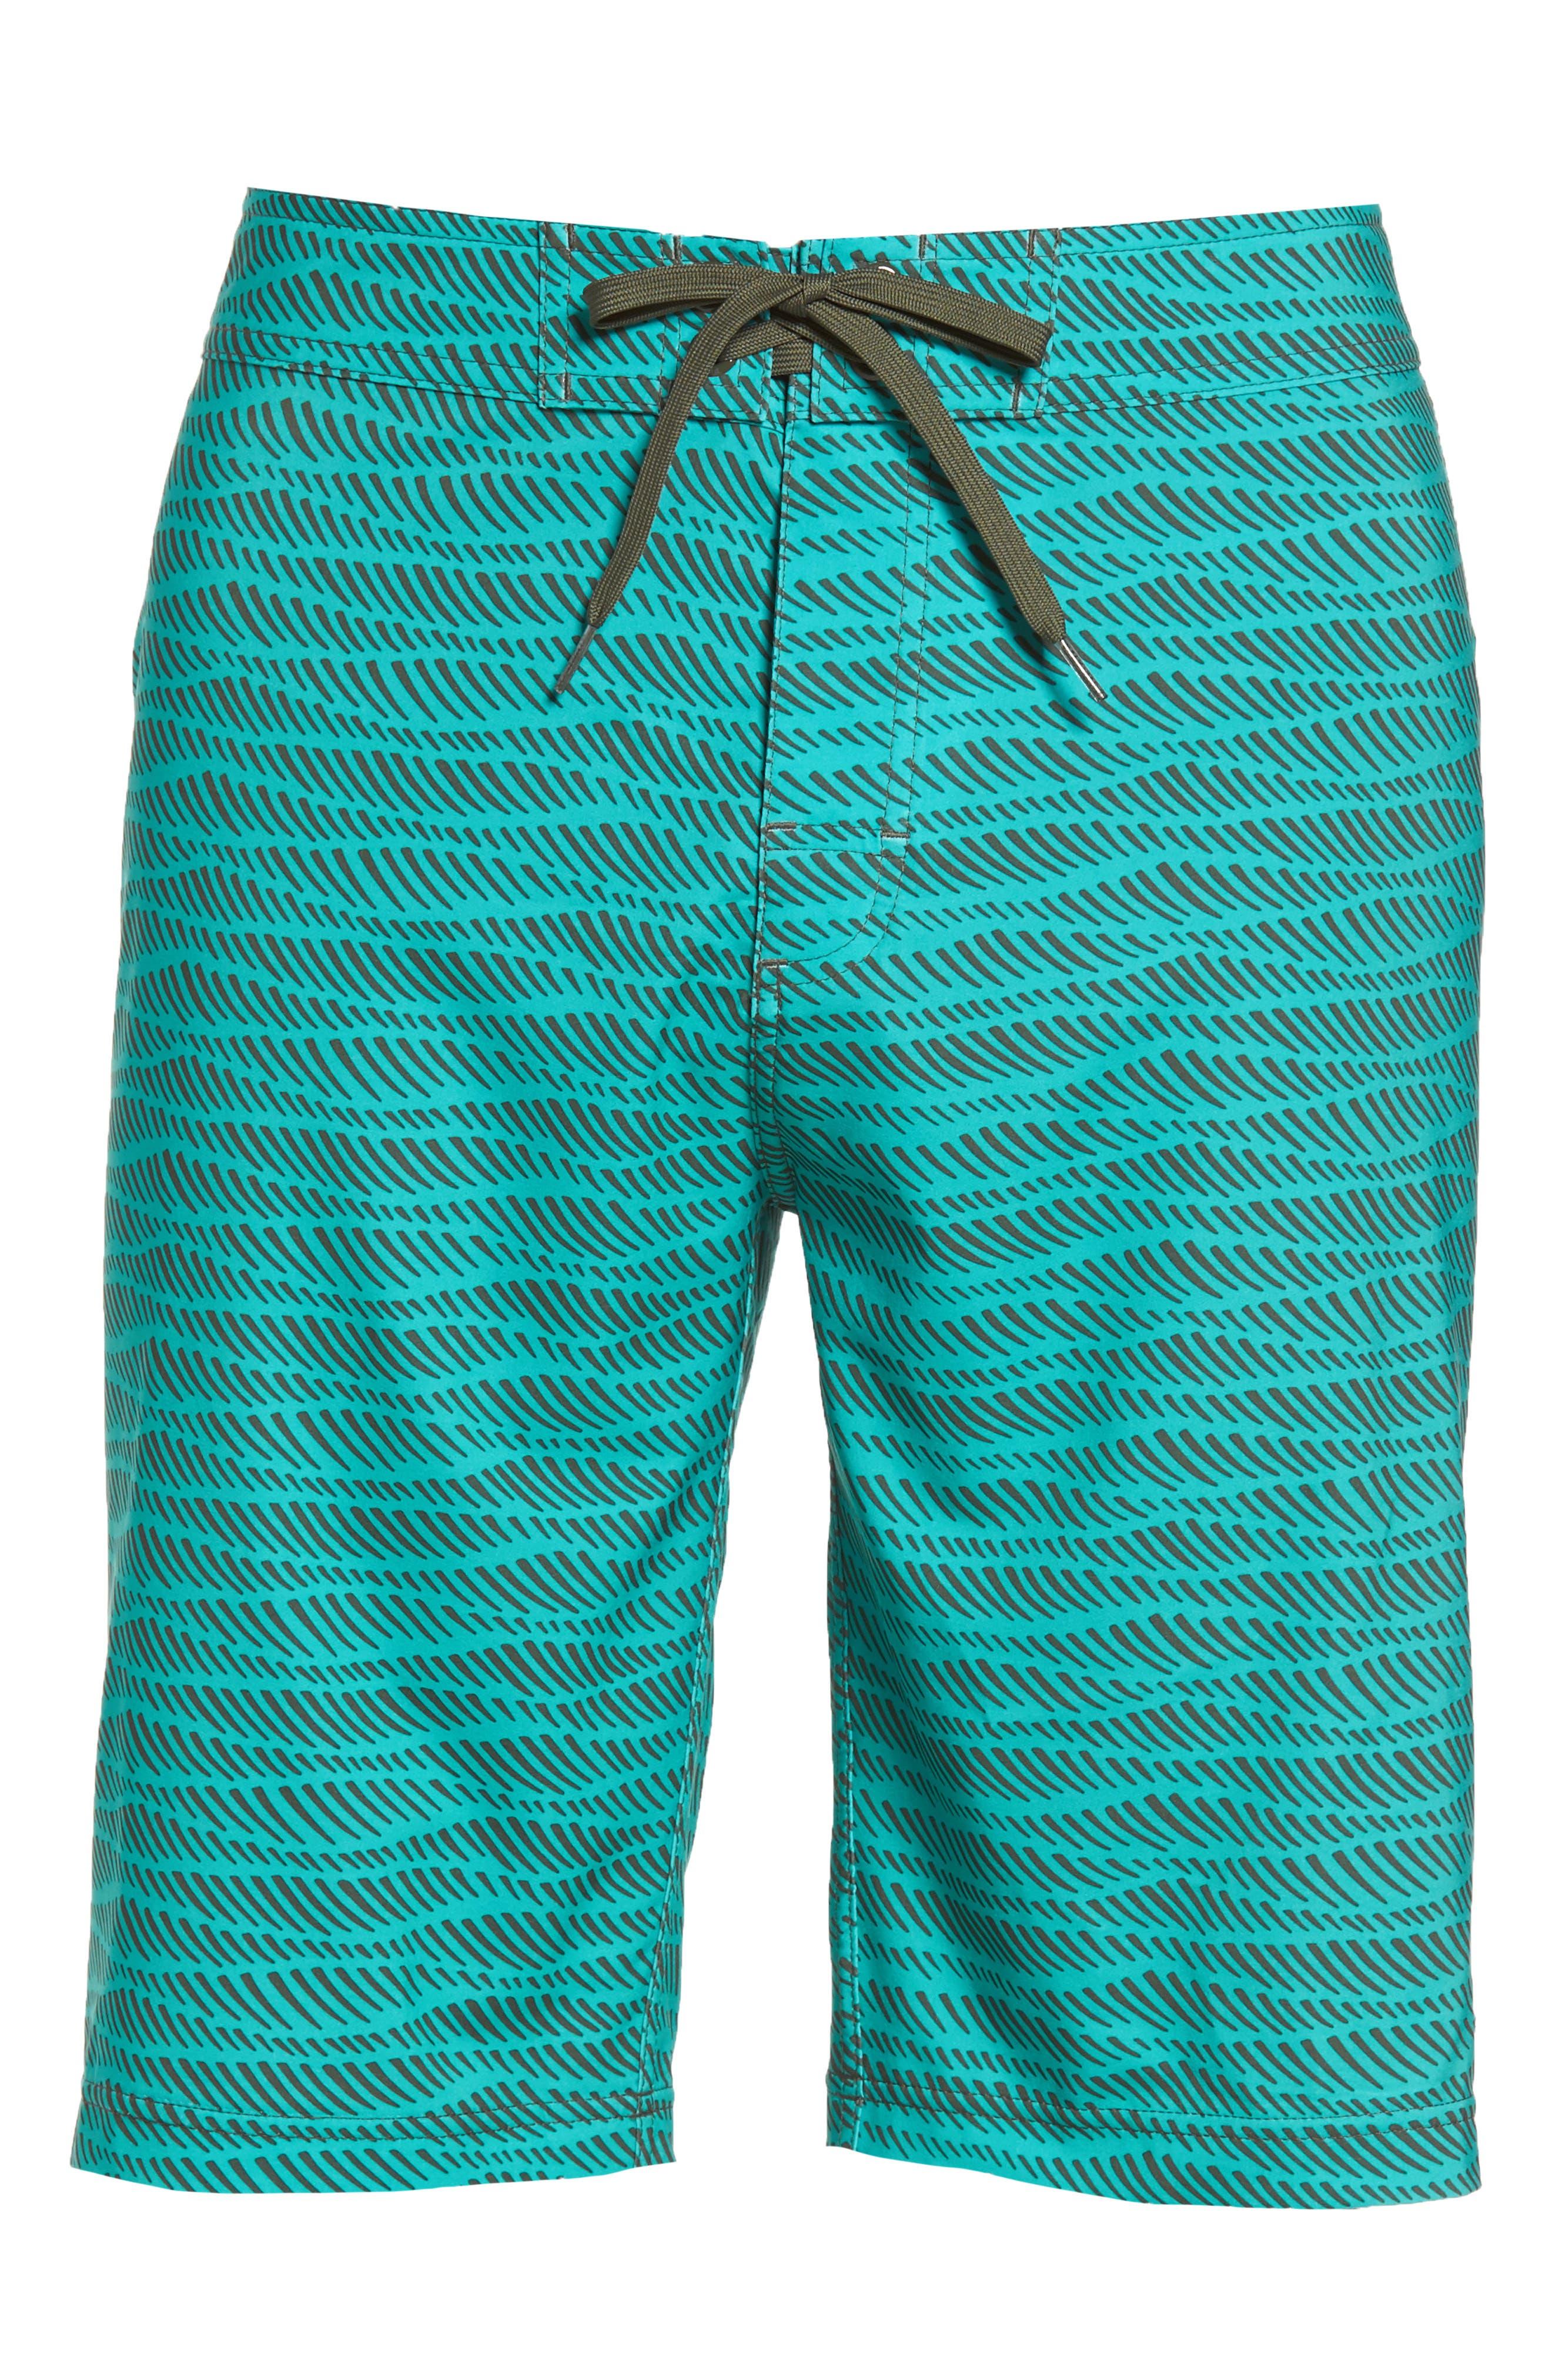 'Sediment' Stretch Board Shorts,                             Alternate thumbnail 80, color,